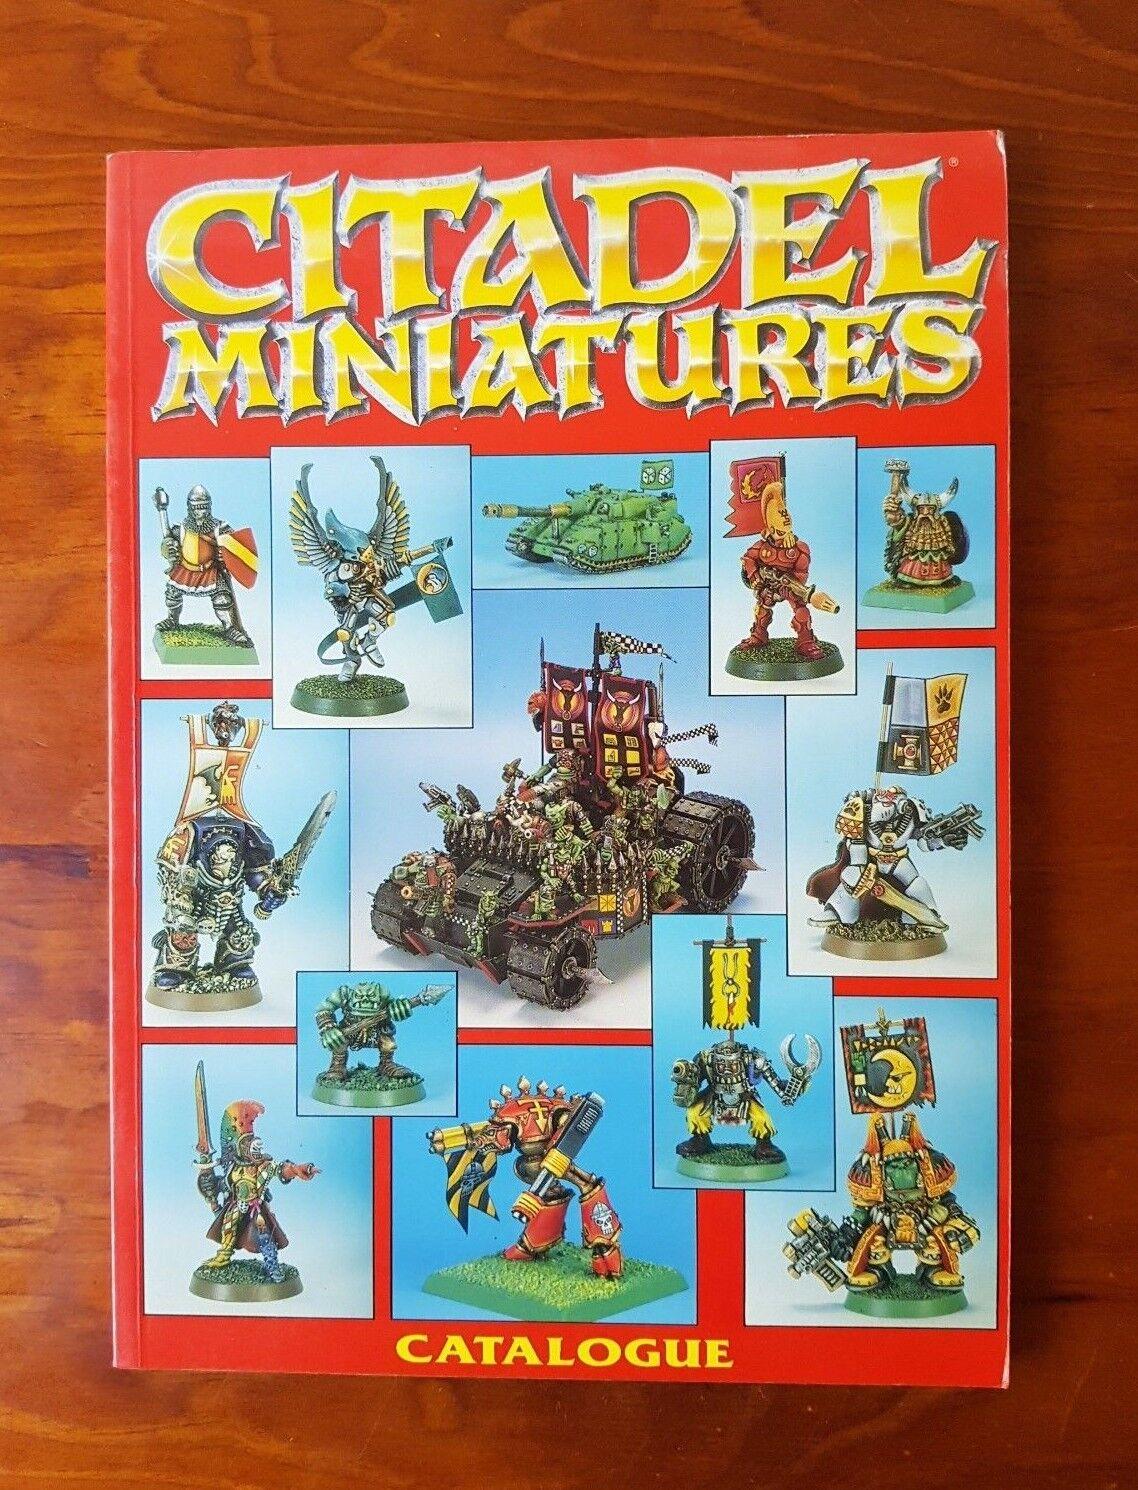 Vintage 1991 Citadel Miniatures Catalogue Section Two Games Workshop RPG Red